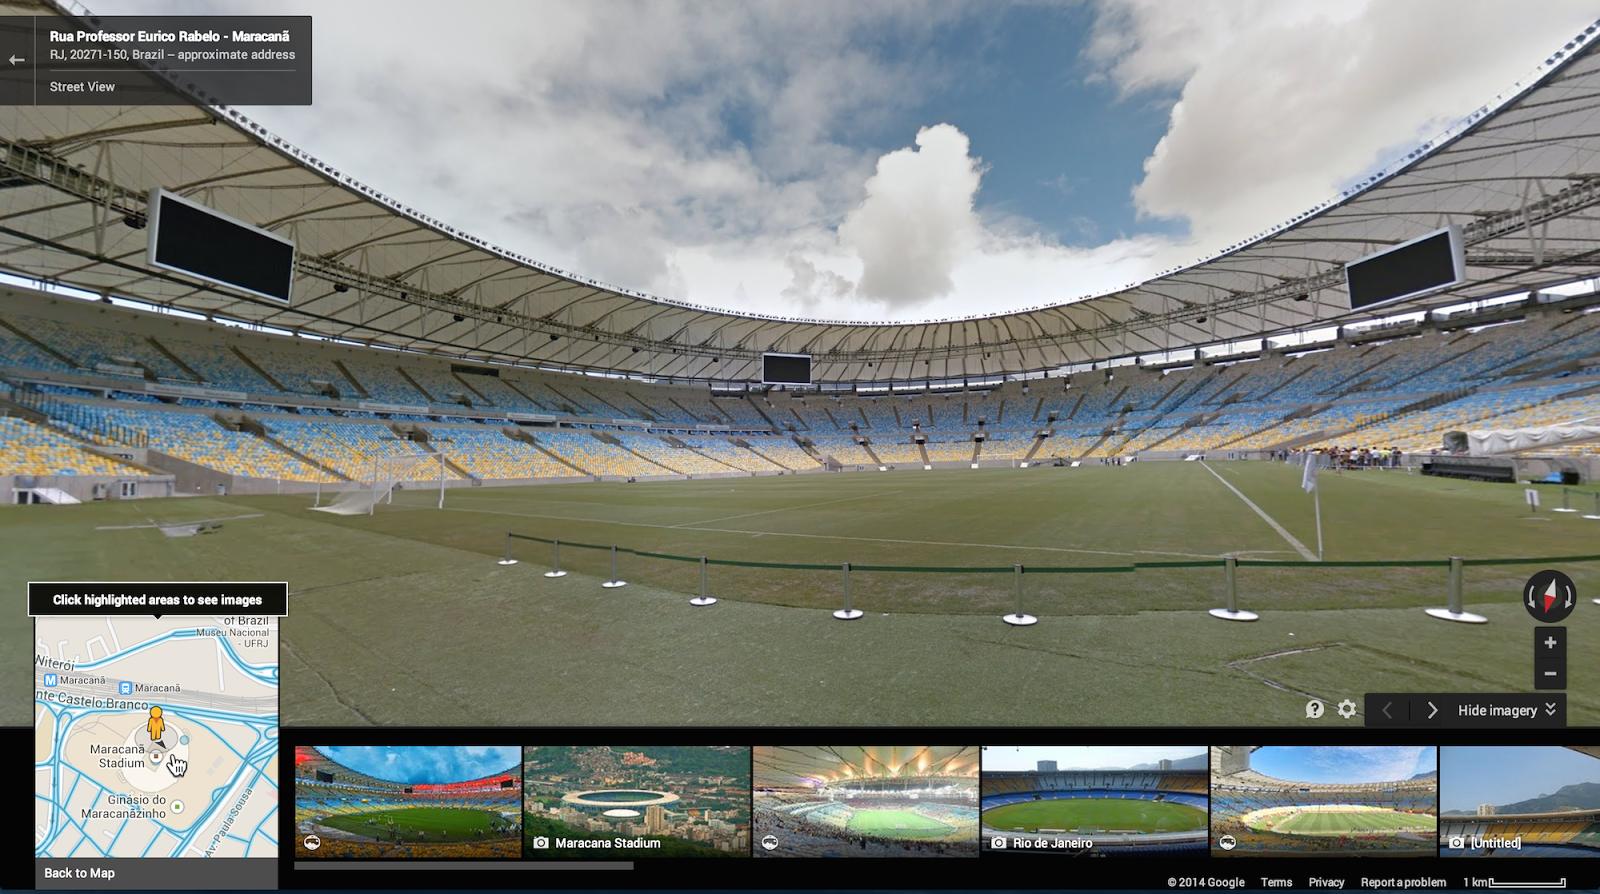 Google Maps view of World Cup stadiums - Maracana